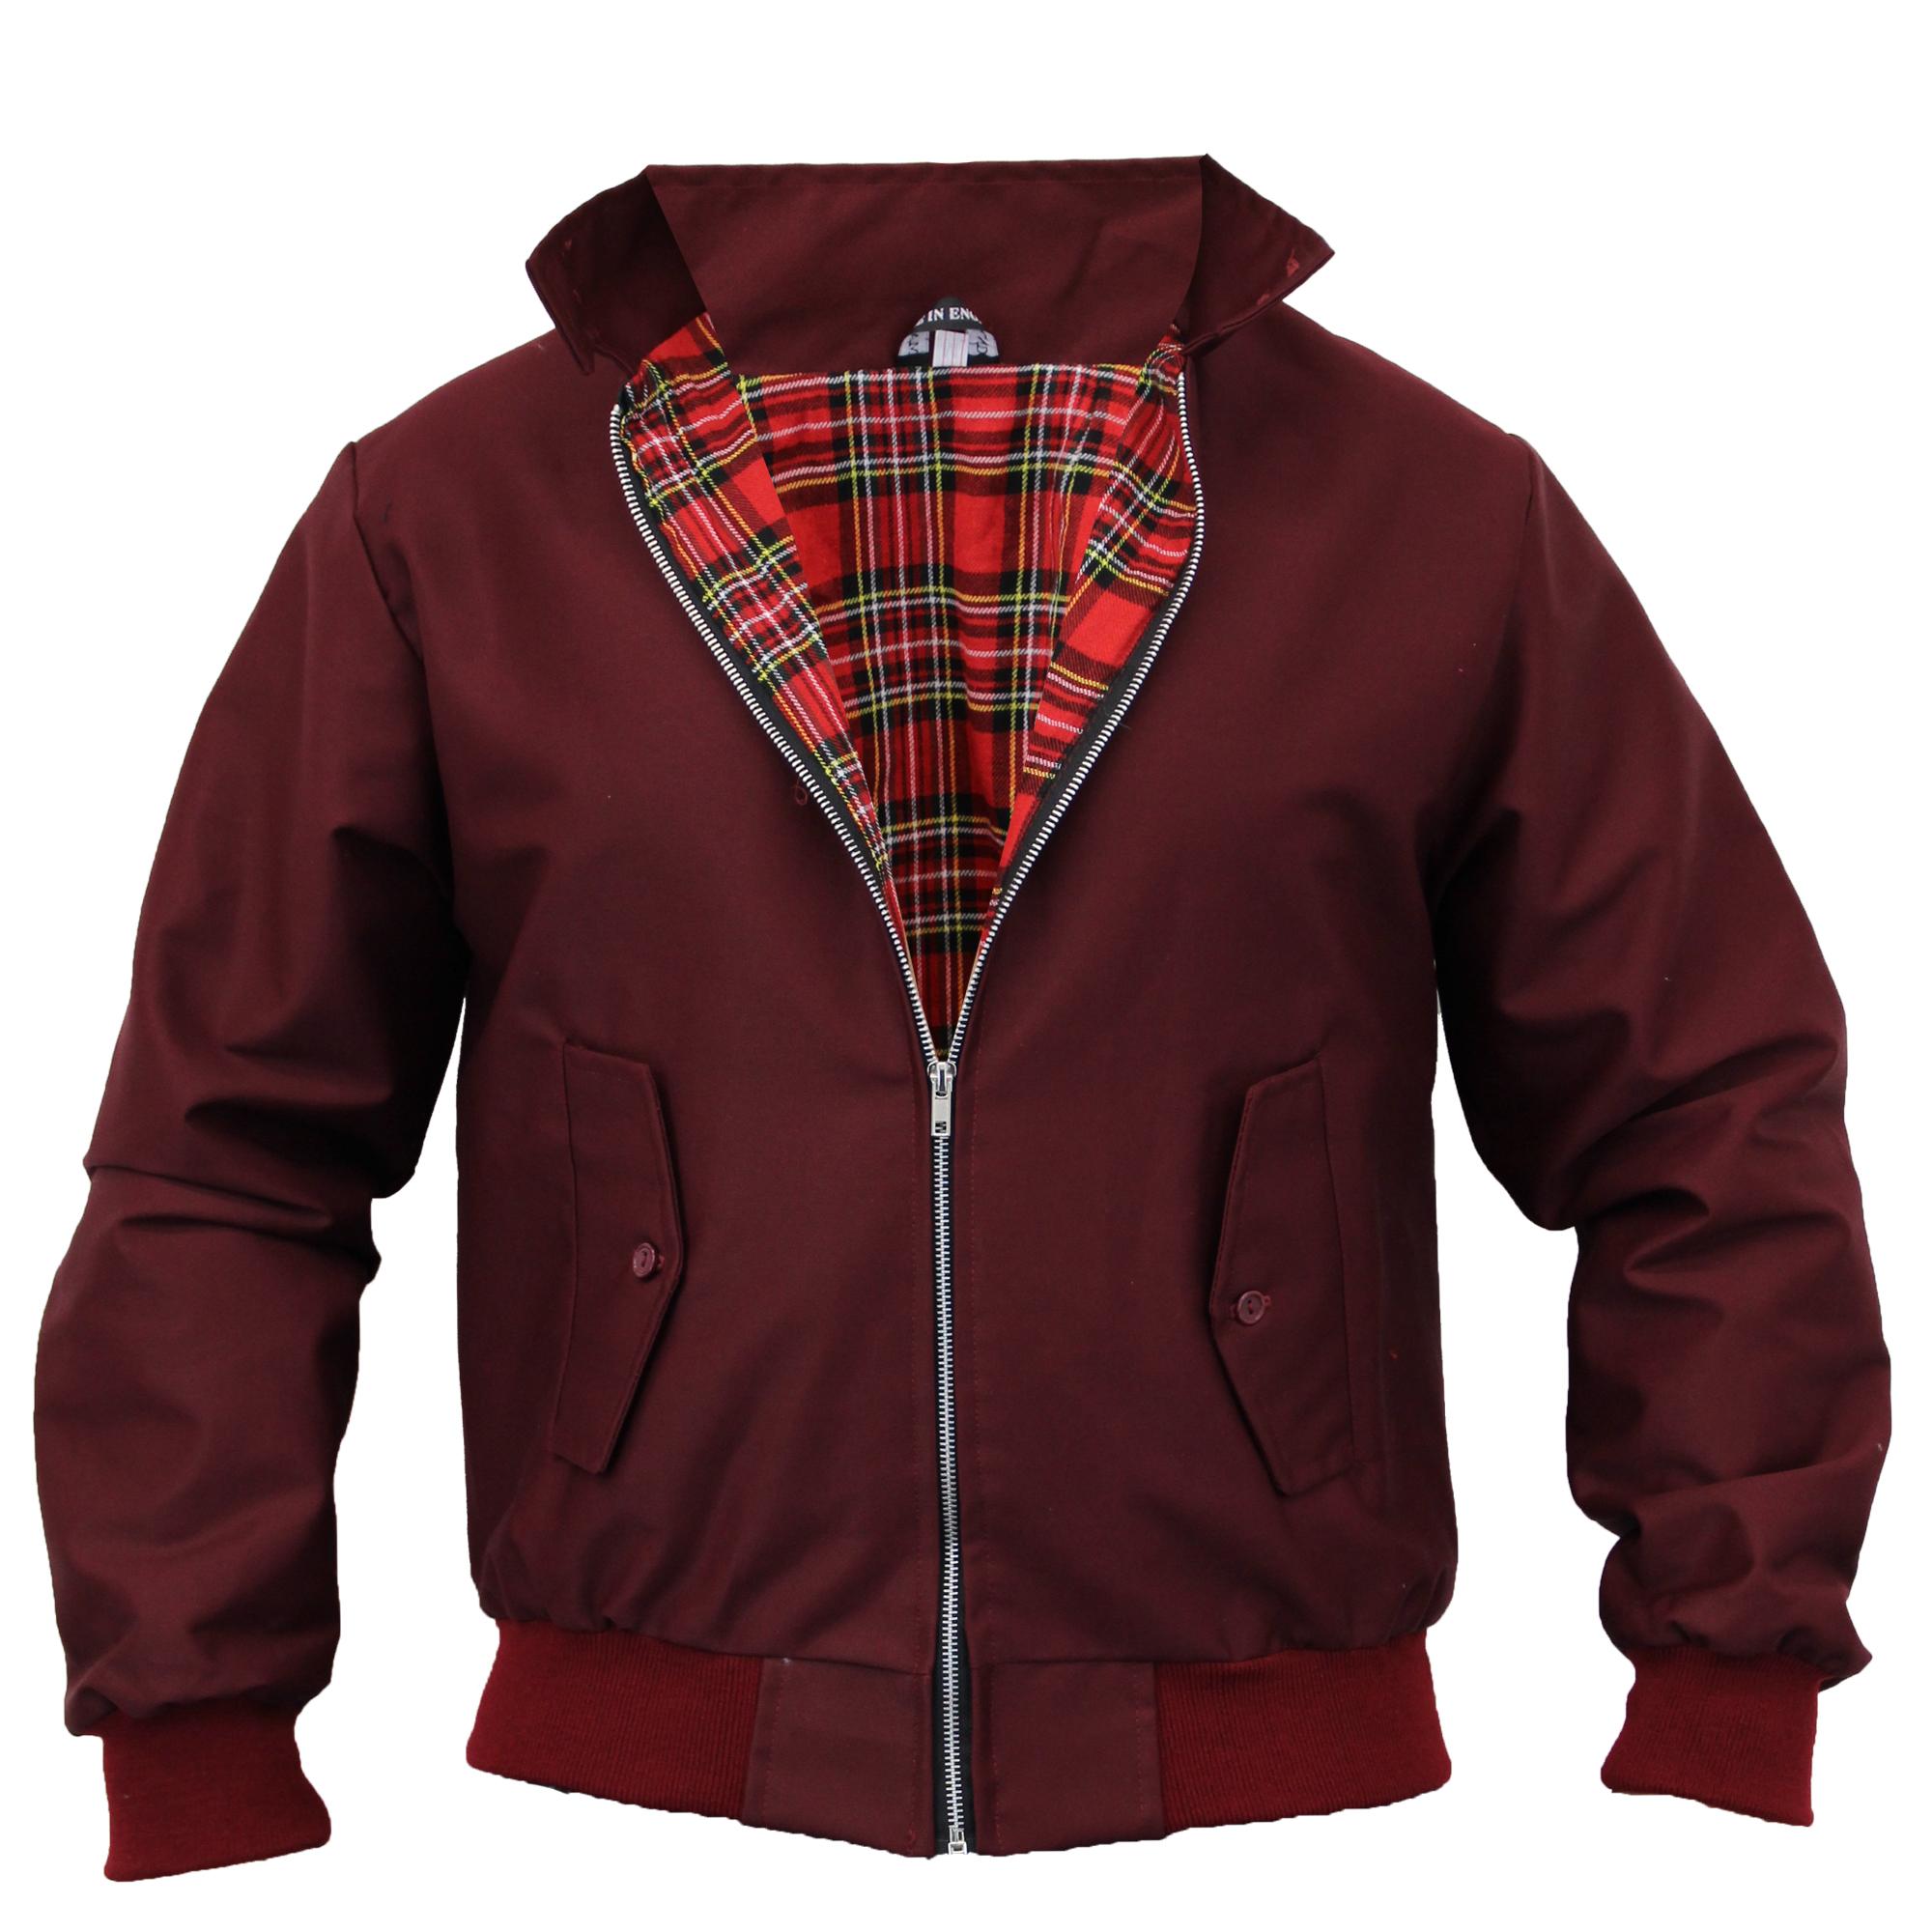 Mens Harrington Jacket Coat Retro Vintage Bomber Tartan ...